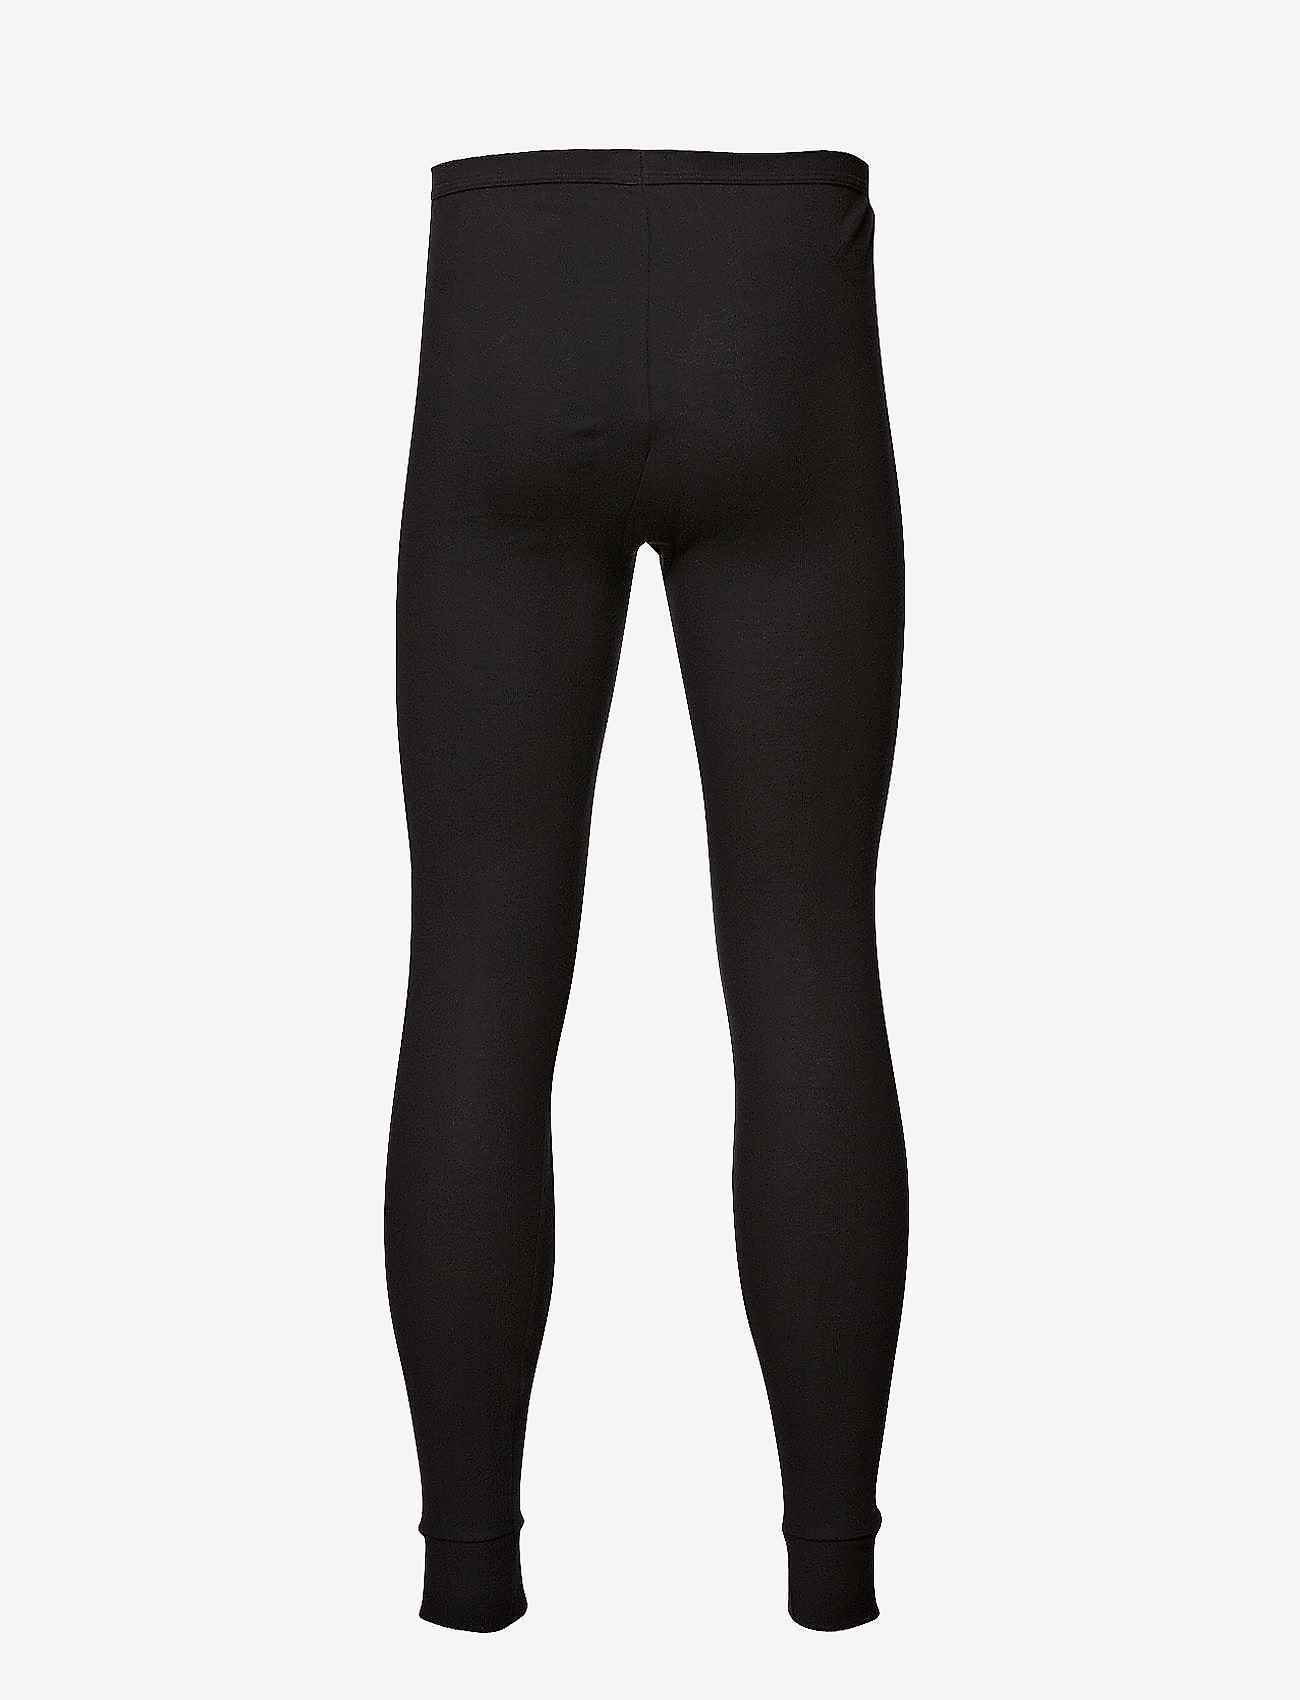 JBS - Original long legs - lange unterhosen - white - 1